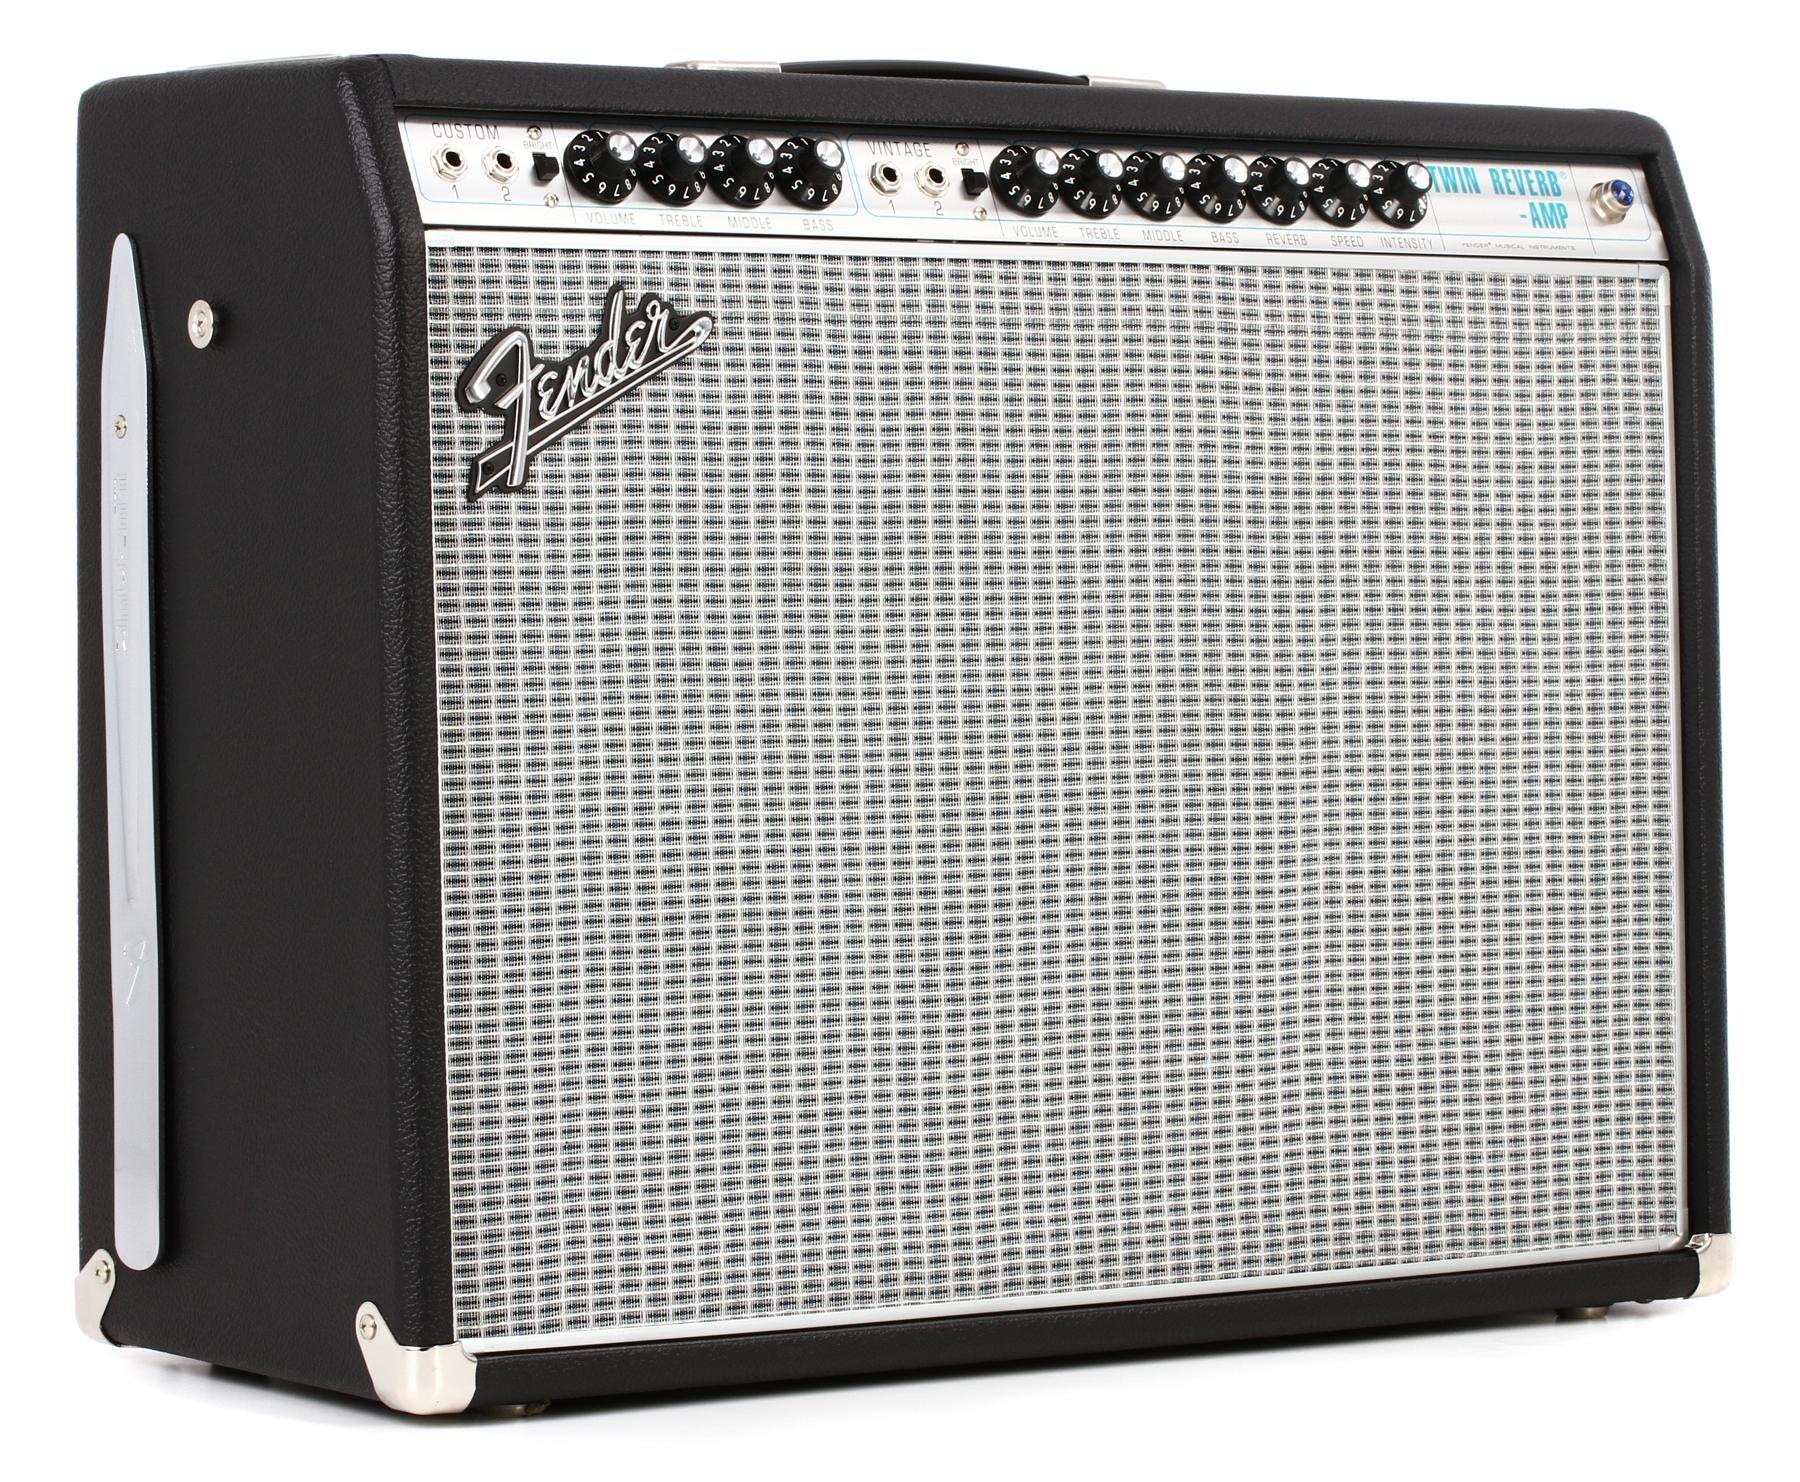 Fender 68 Custom Twin Reverb 85 Watt 2x12 Tube Combo Amp Sweetwater 70 Guitar Amplifier Circuit Preamplifier Tone Control For